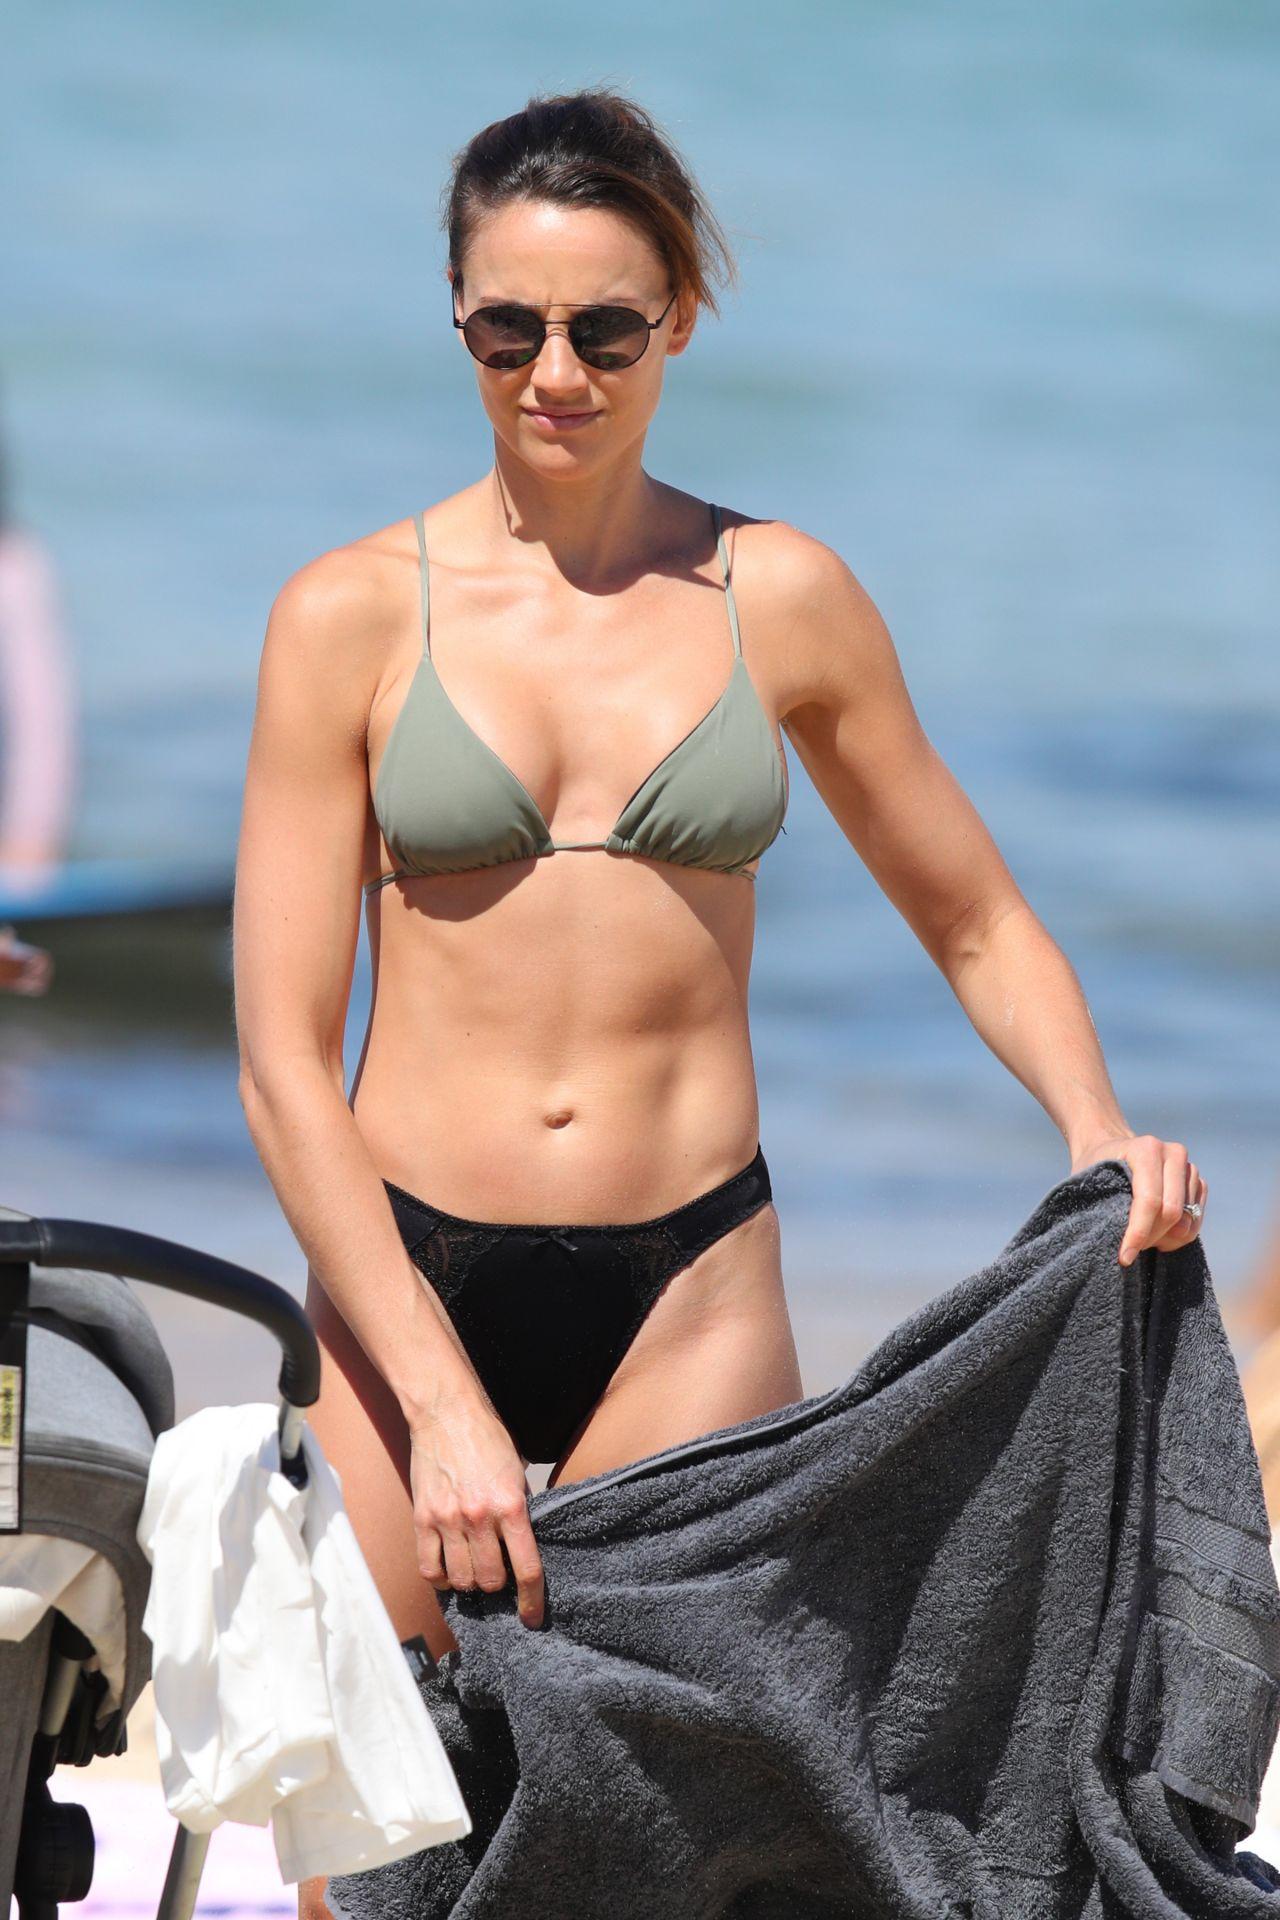 Sofia hublitz bikini